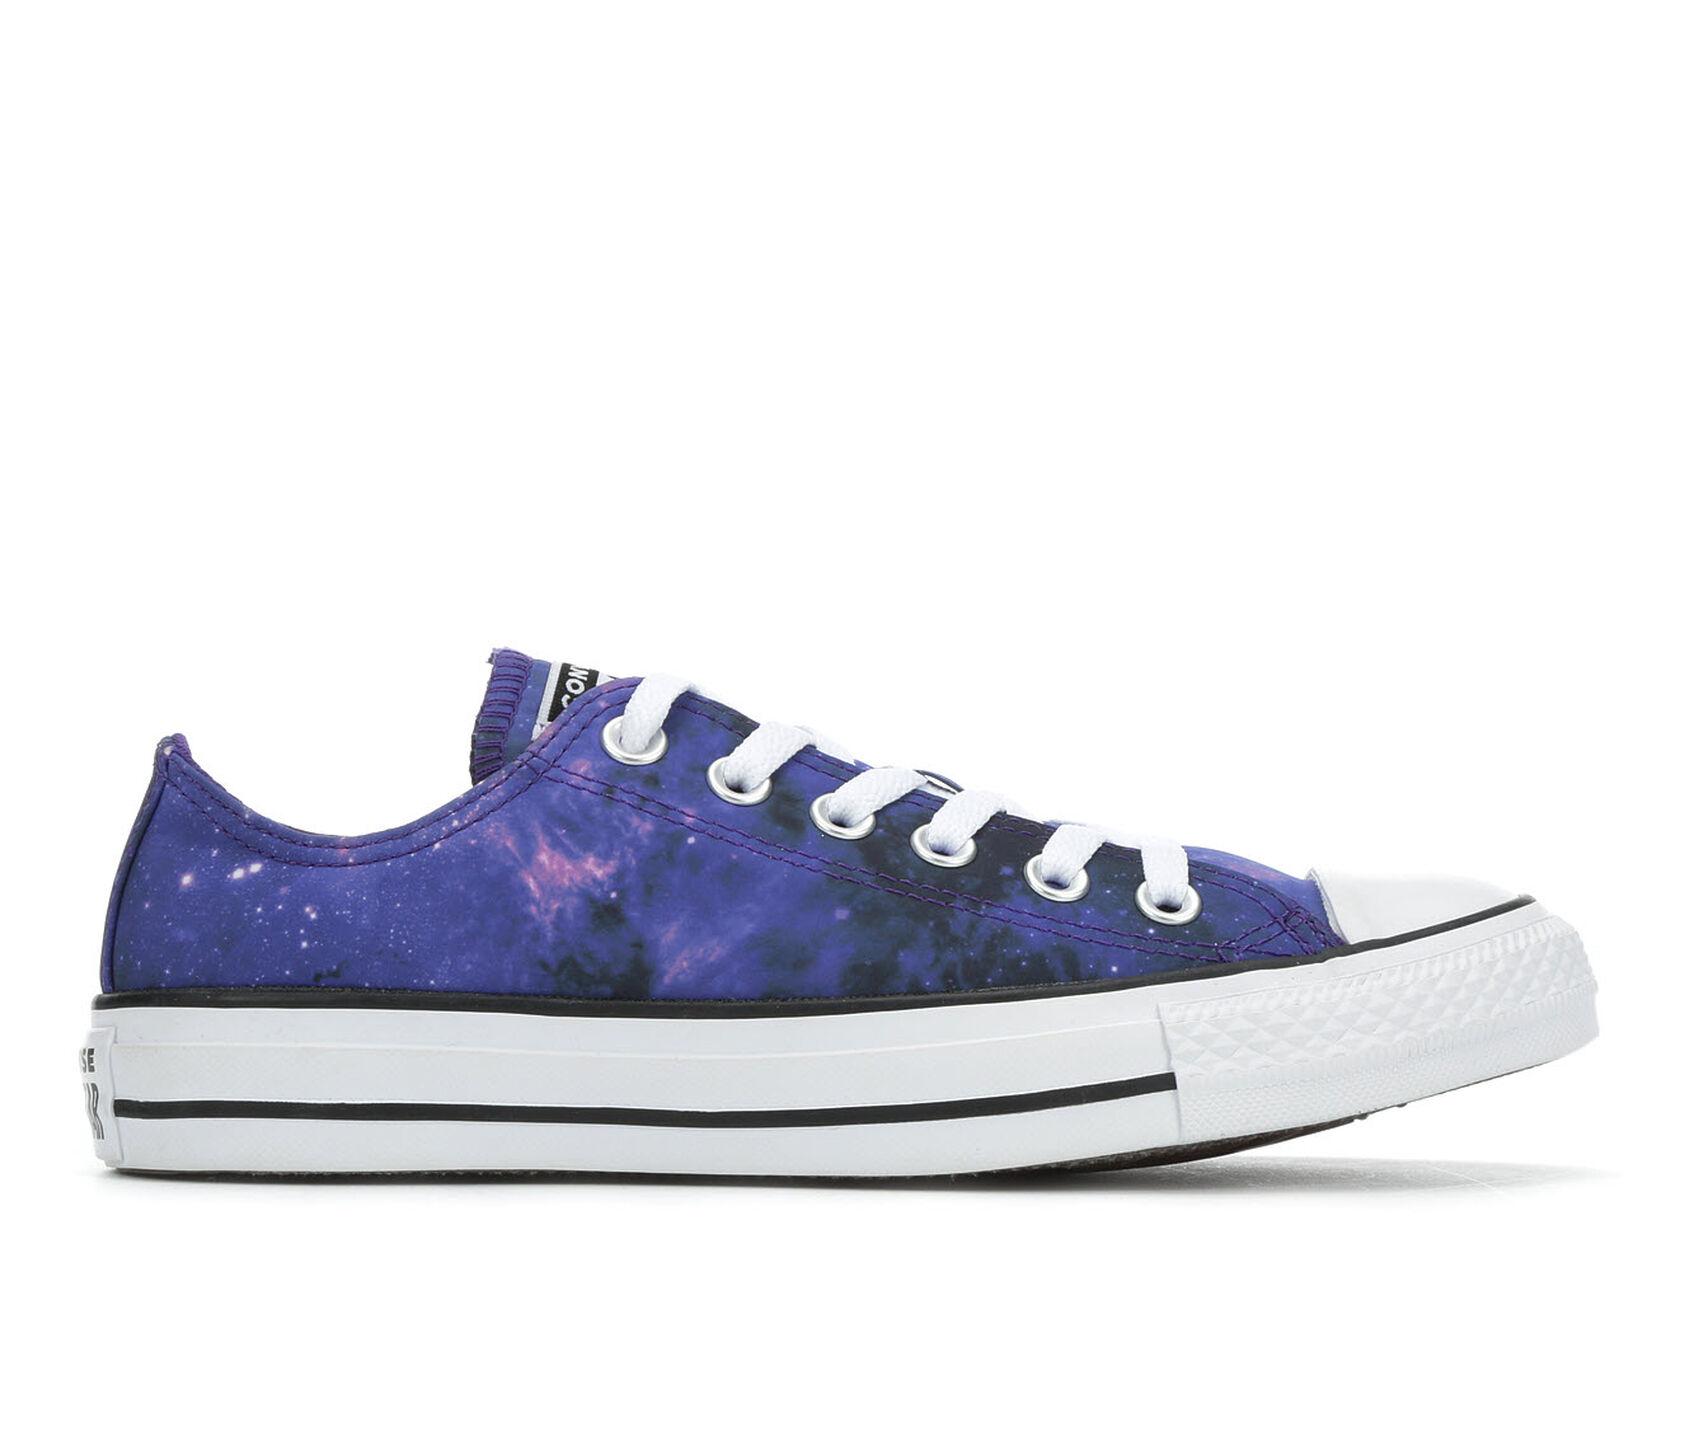 a4f2563600f40 Adults' Converse Chuck Taylor All Star Galaxy Ox Sneakers